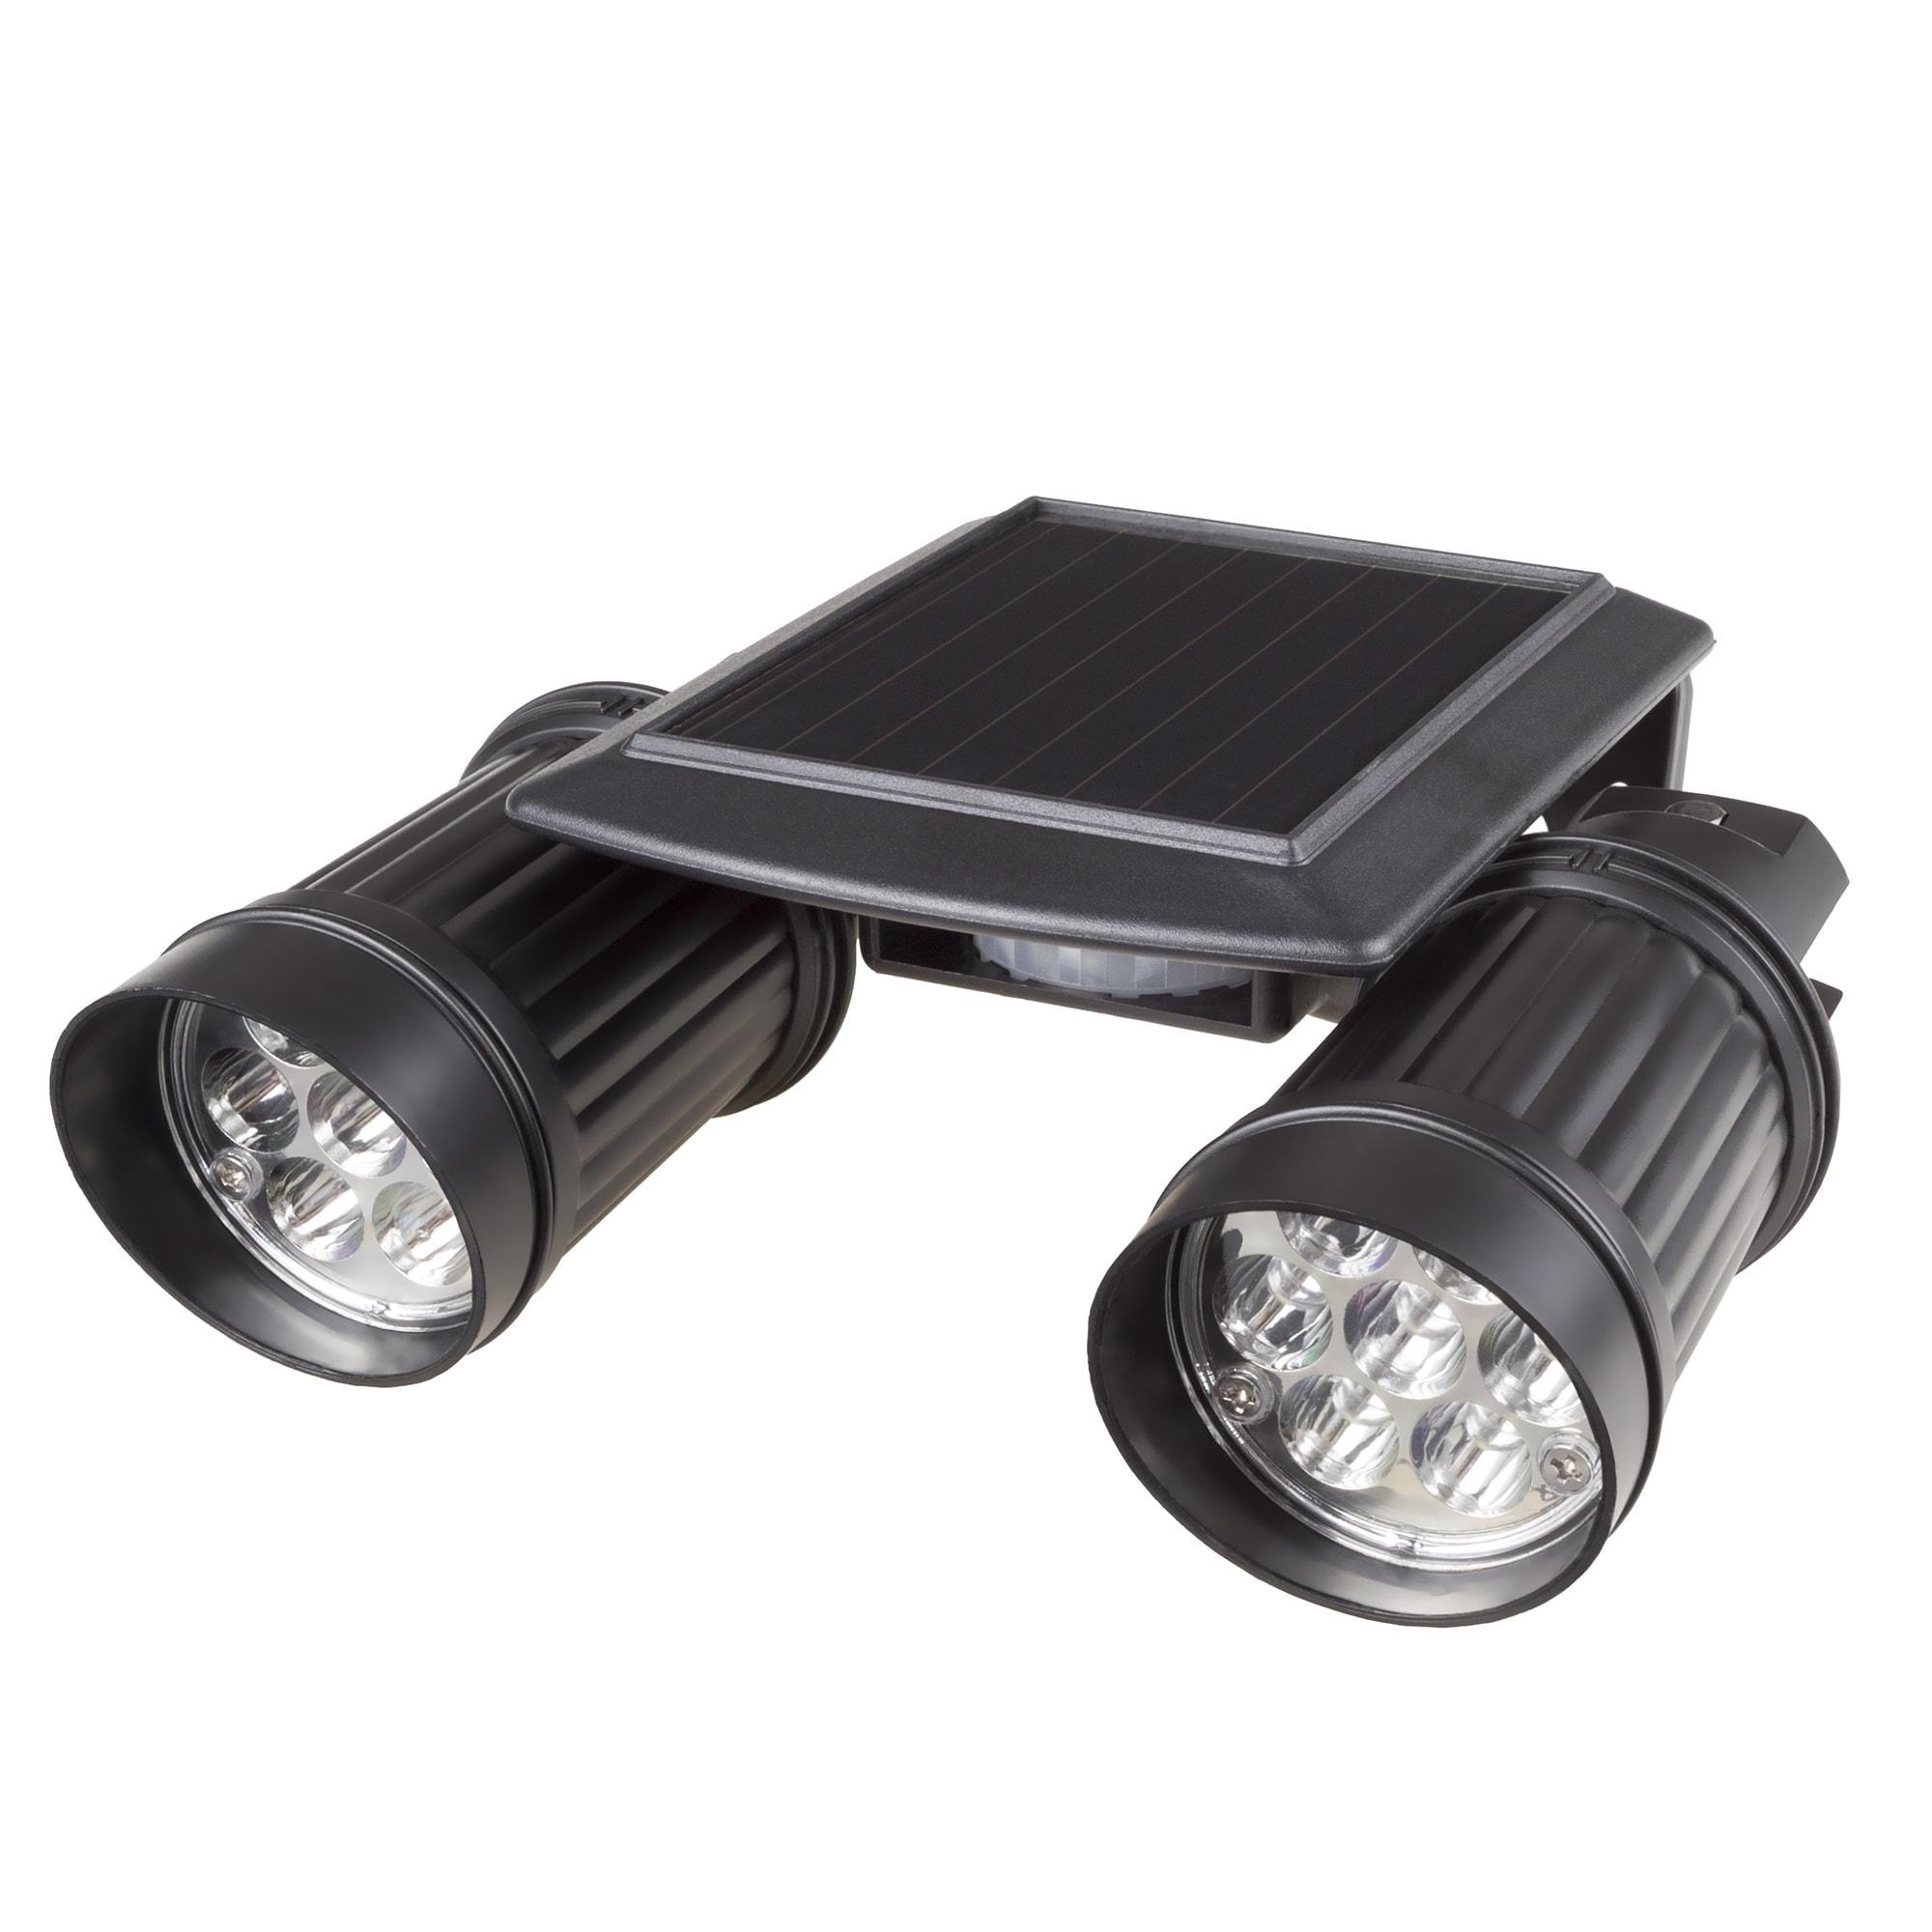 Stalwart Solar Powered 14 LED Dual Head Motion Sensor Wal...